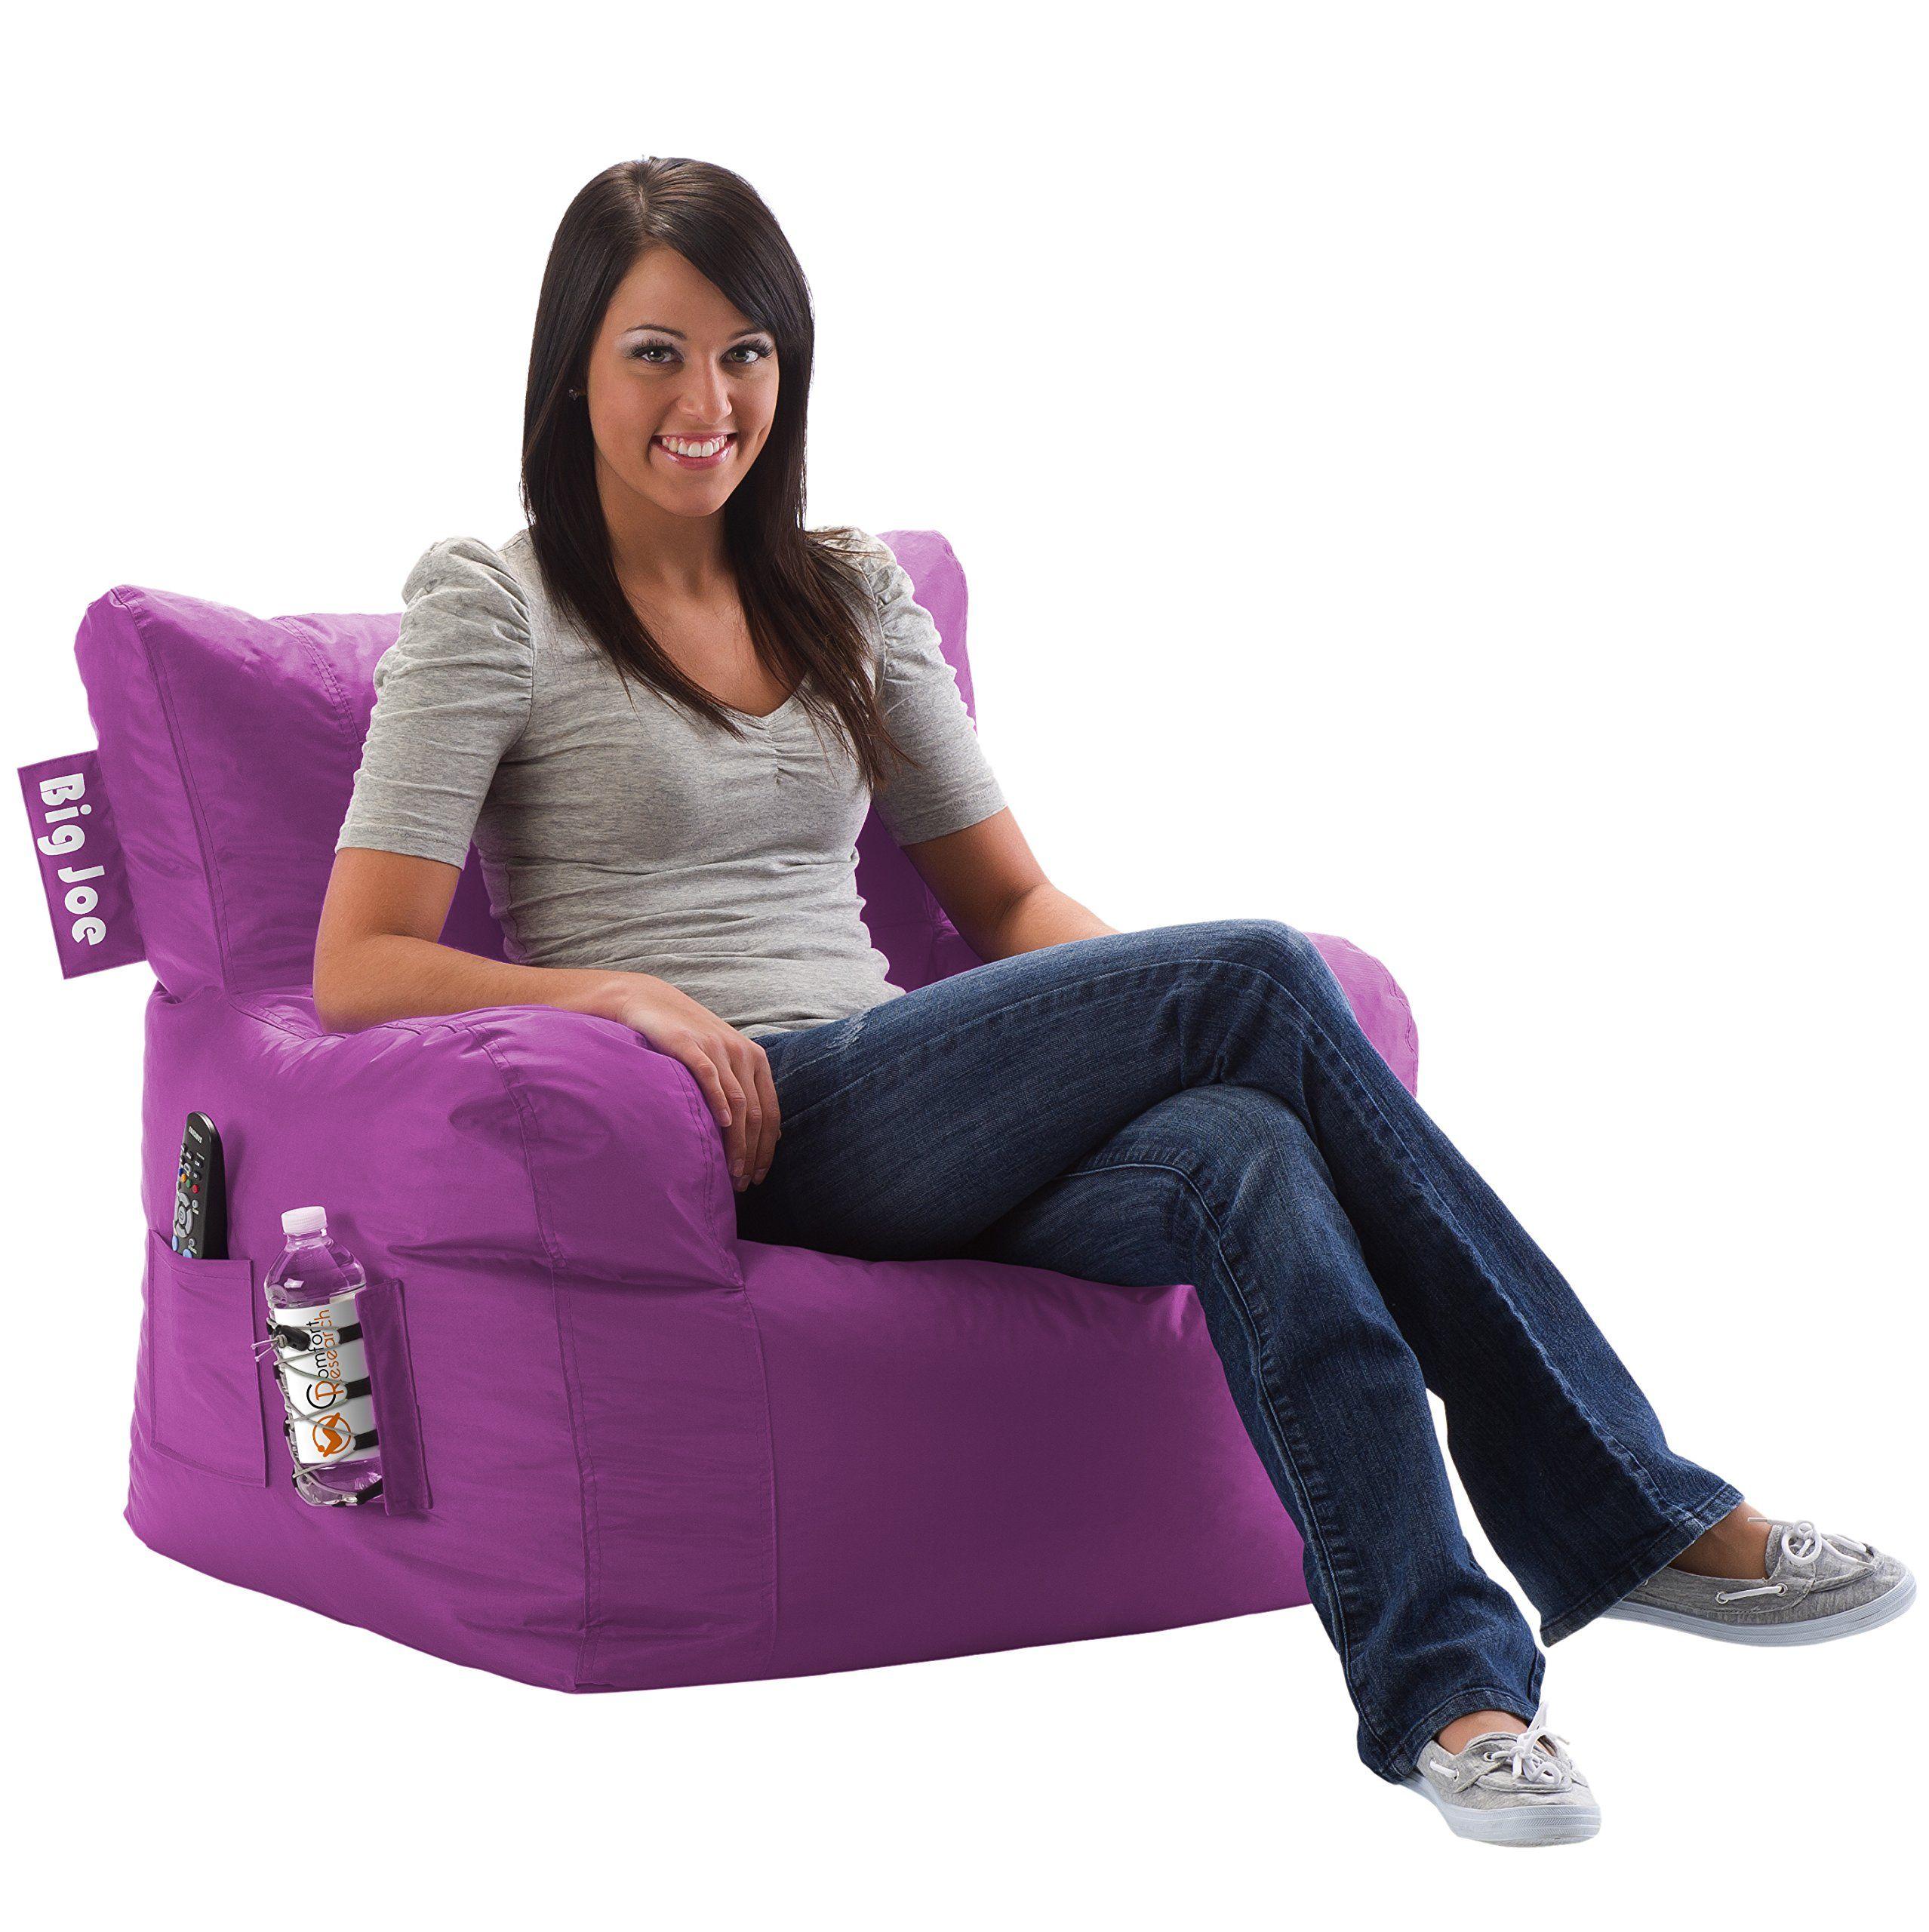 Big Joe Dorm Chair, Radiant Orchid Home